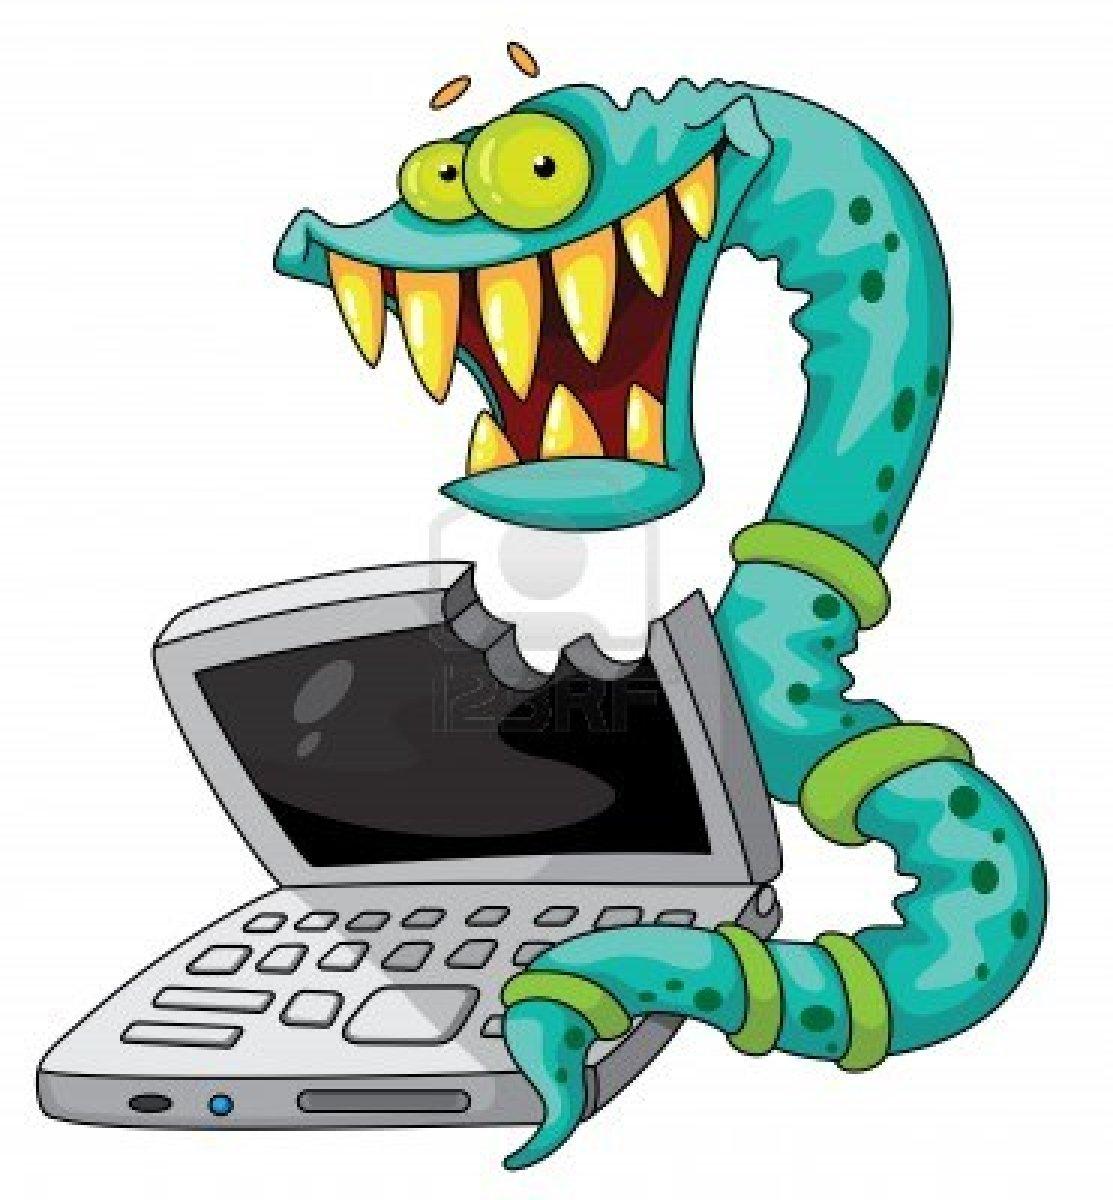 virus clipart at getdrawings com free for personal use virus rh getdrawings com